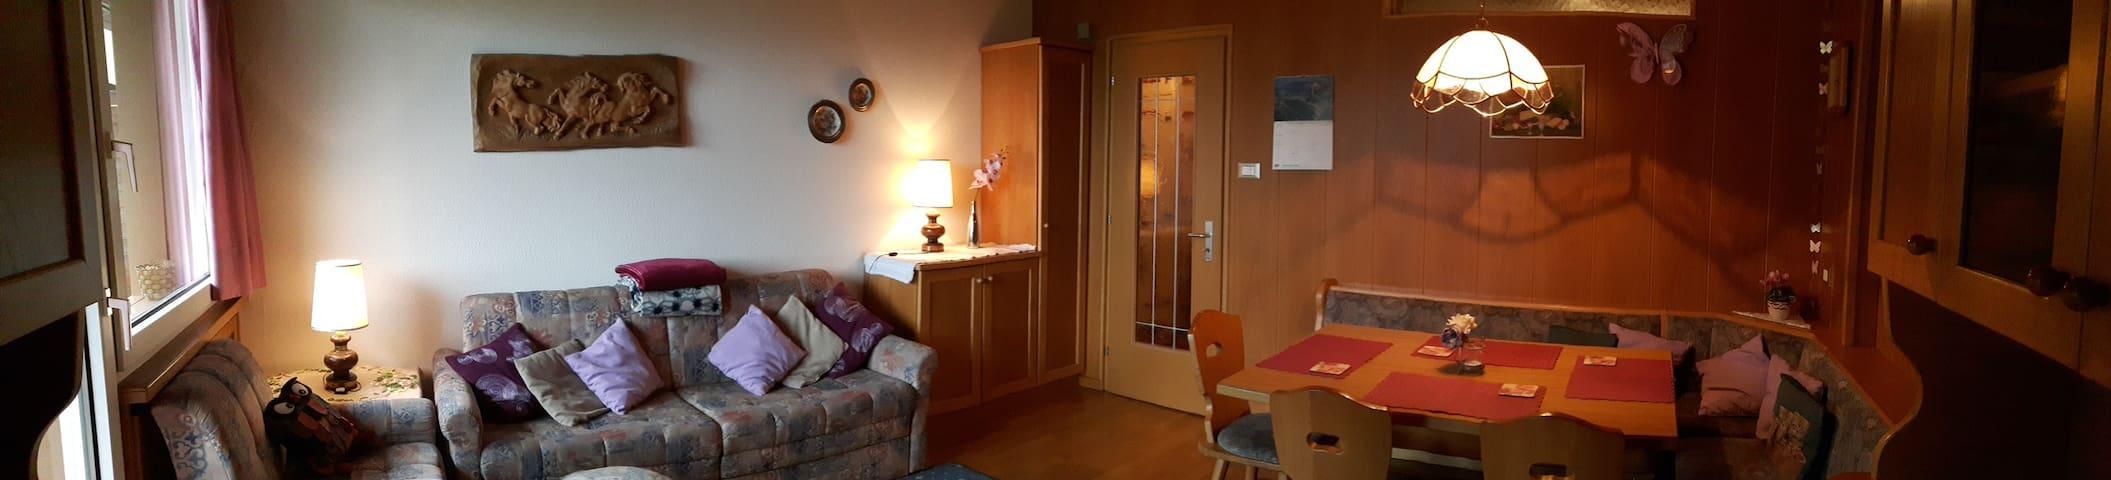 Soggiorno- living room- Wohnzimmer